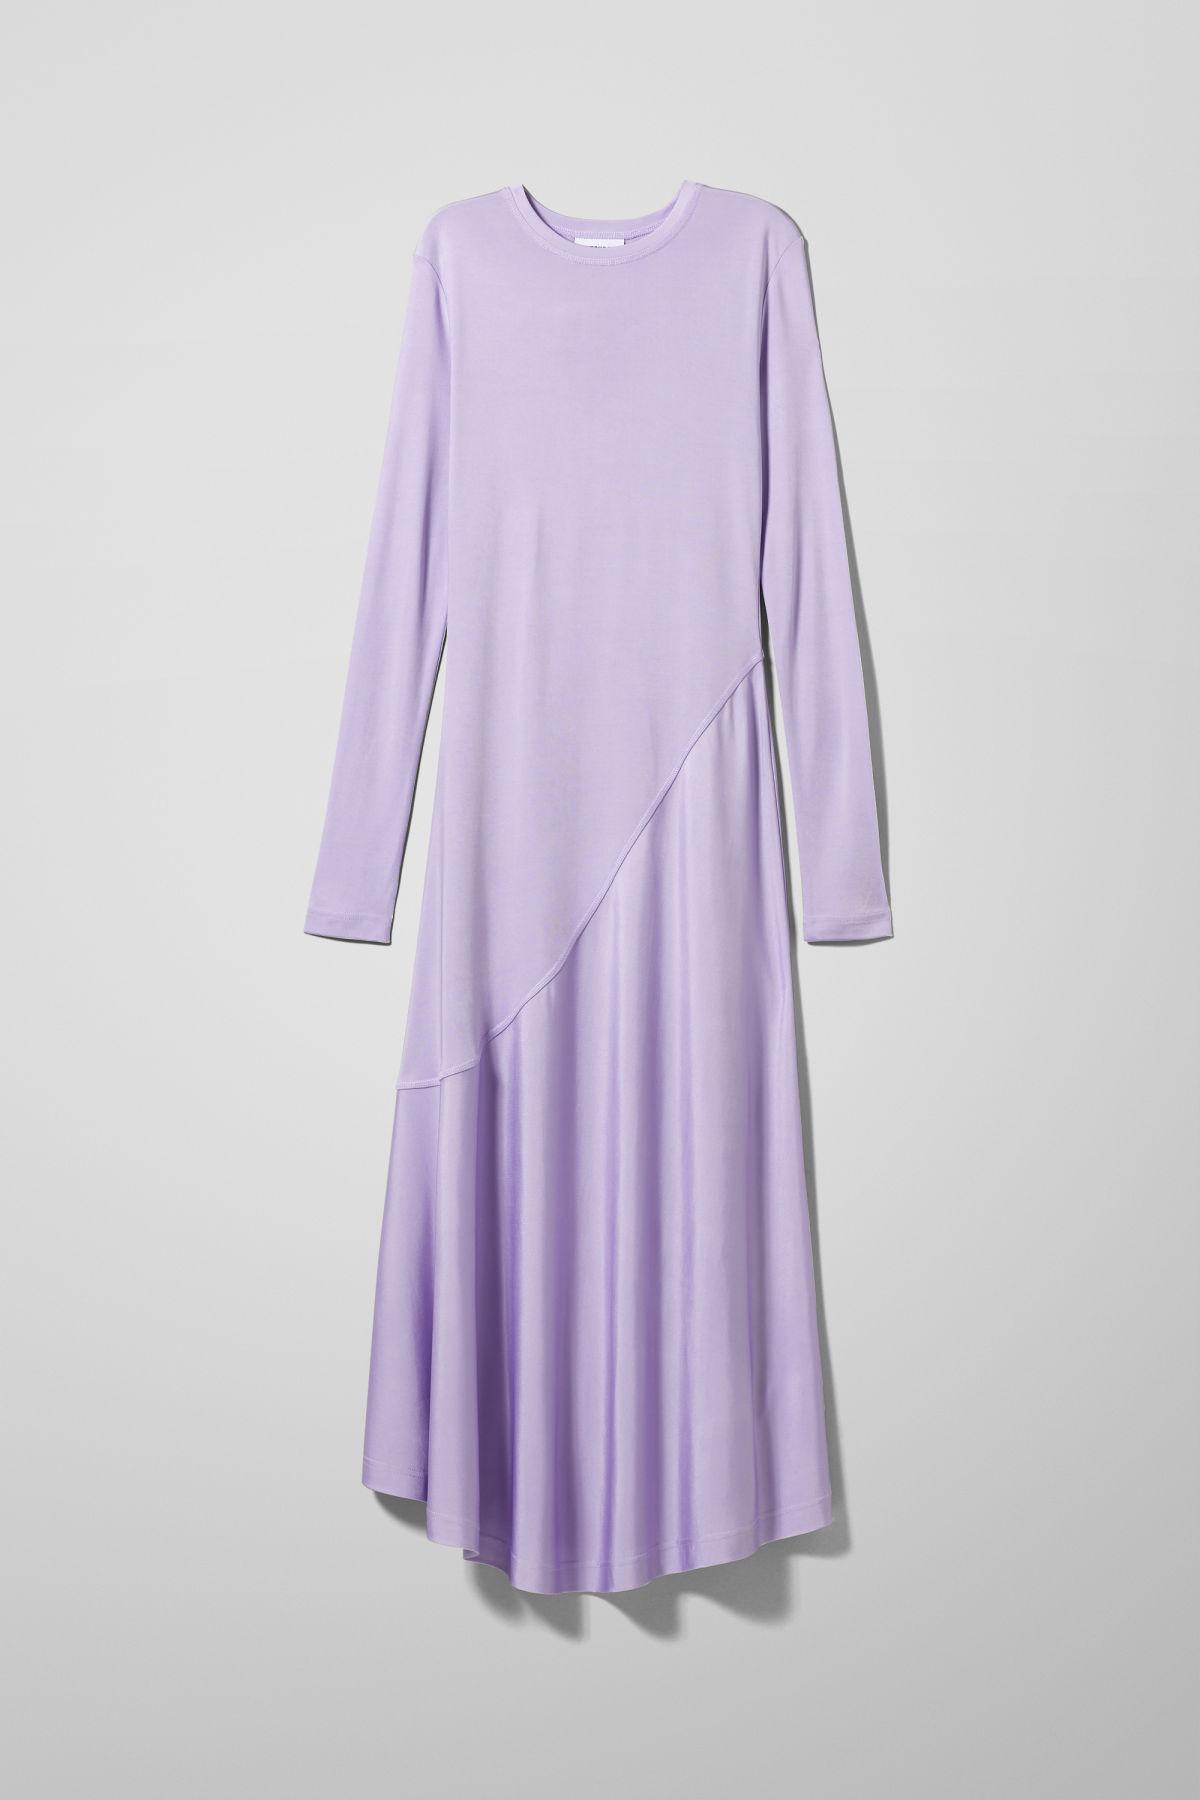 Image of Karen Dress - Purple-XS